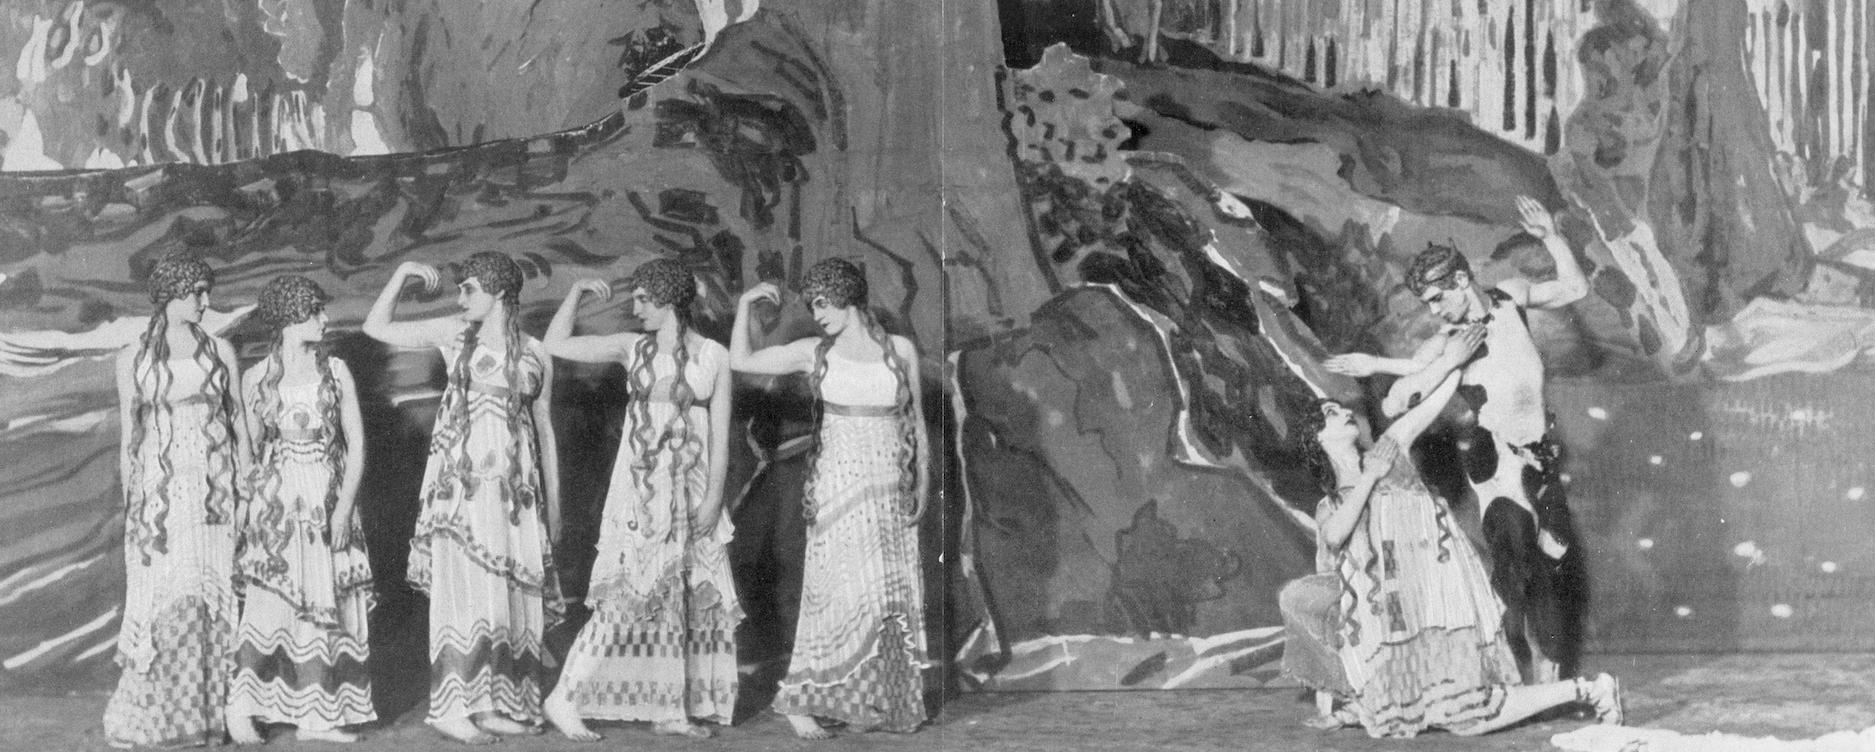 Ballet Russes in L'Apres midi d'un faune.